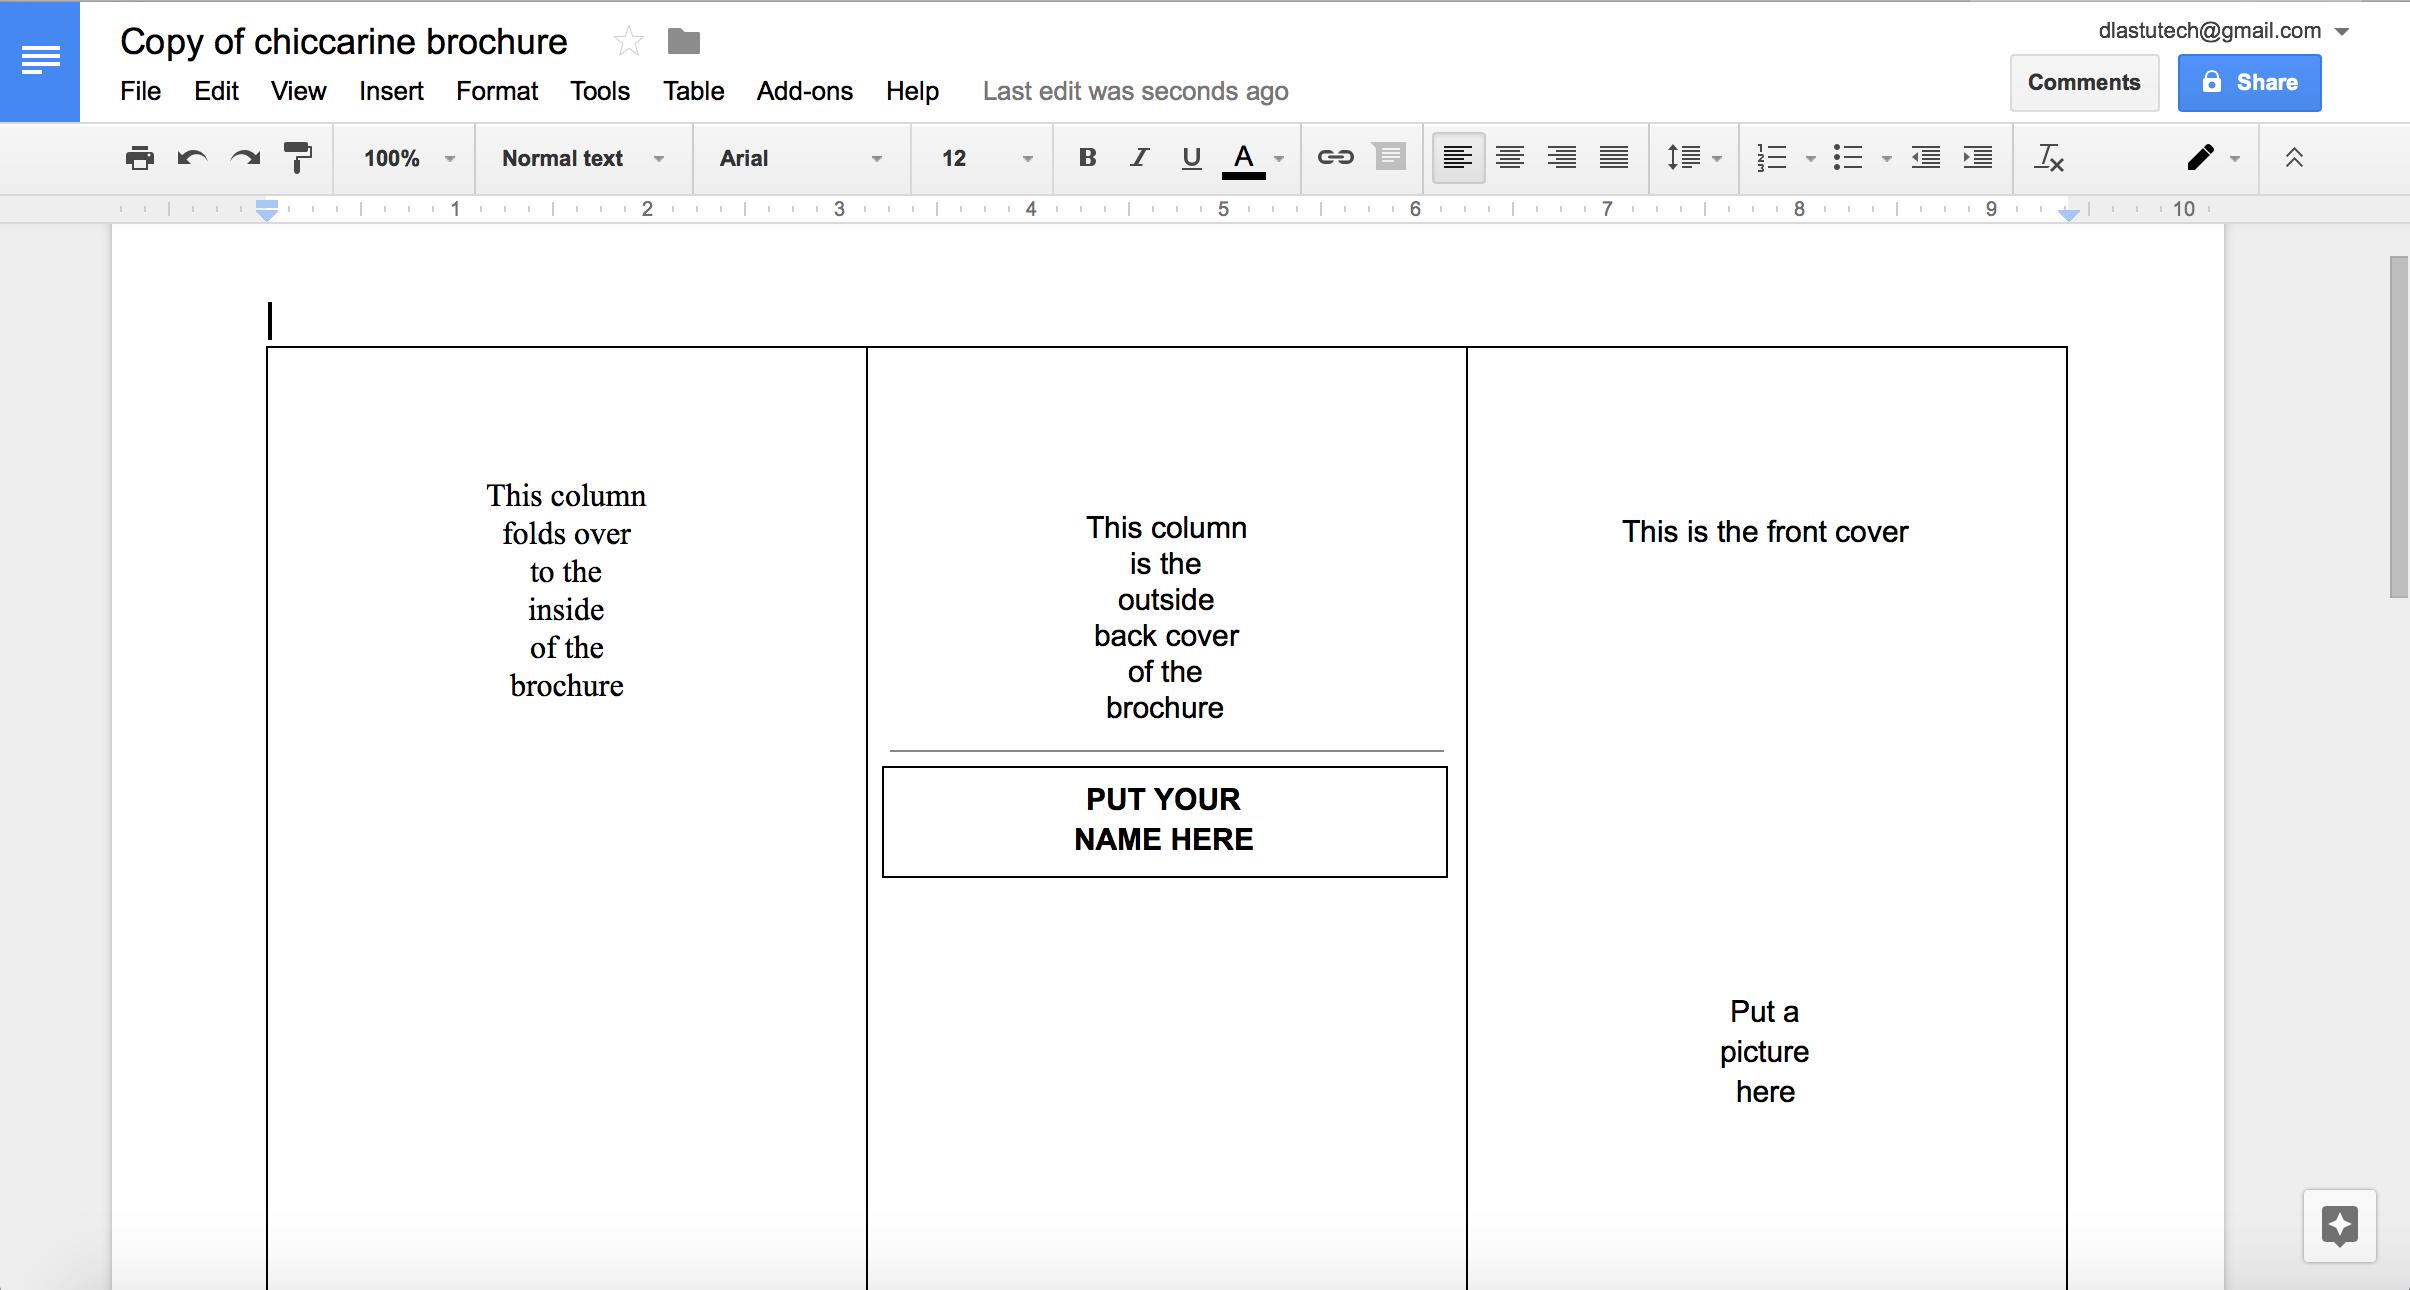 001 Brochure Templates Google Luxury Tutorial Making Using With Regard To Brochure Template Google Drive